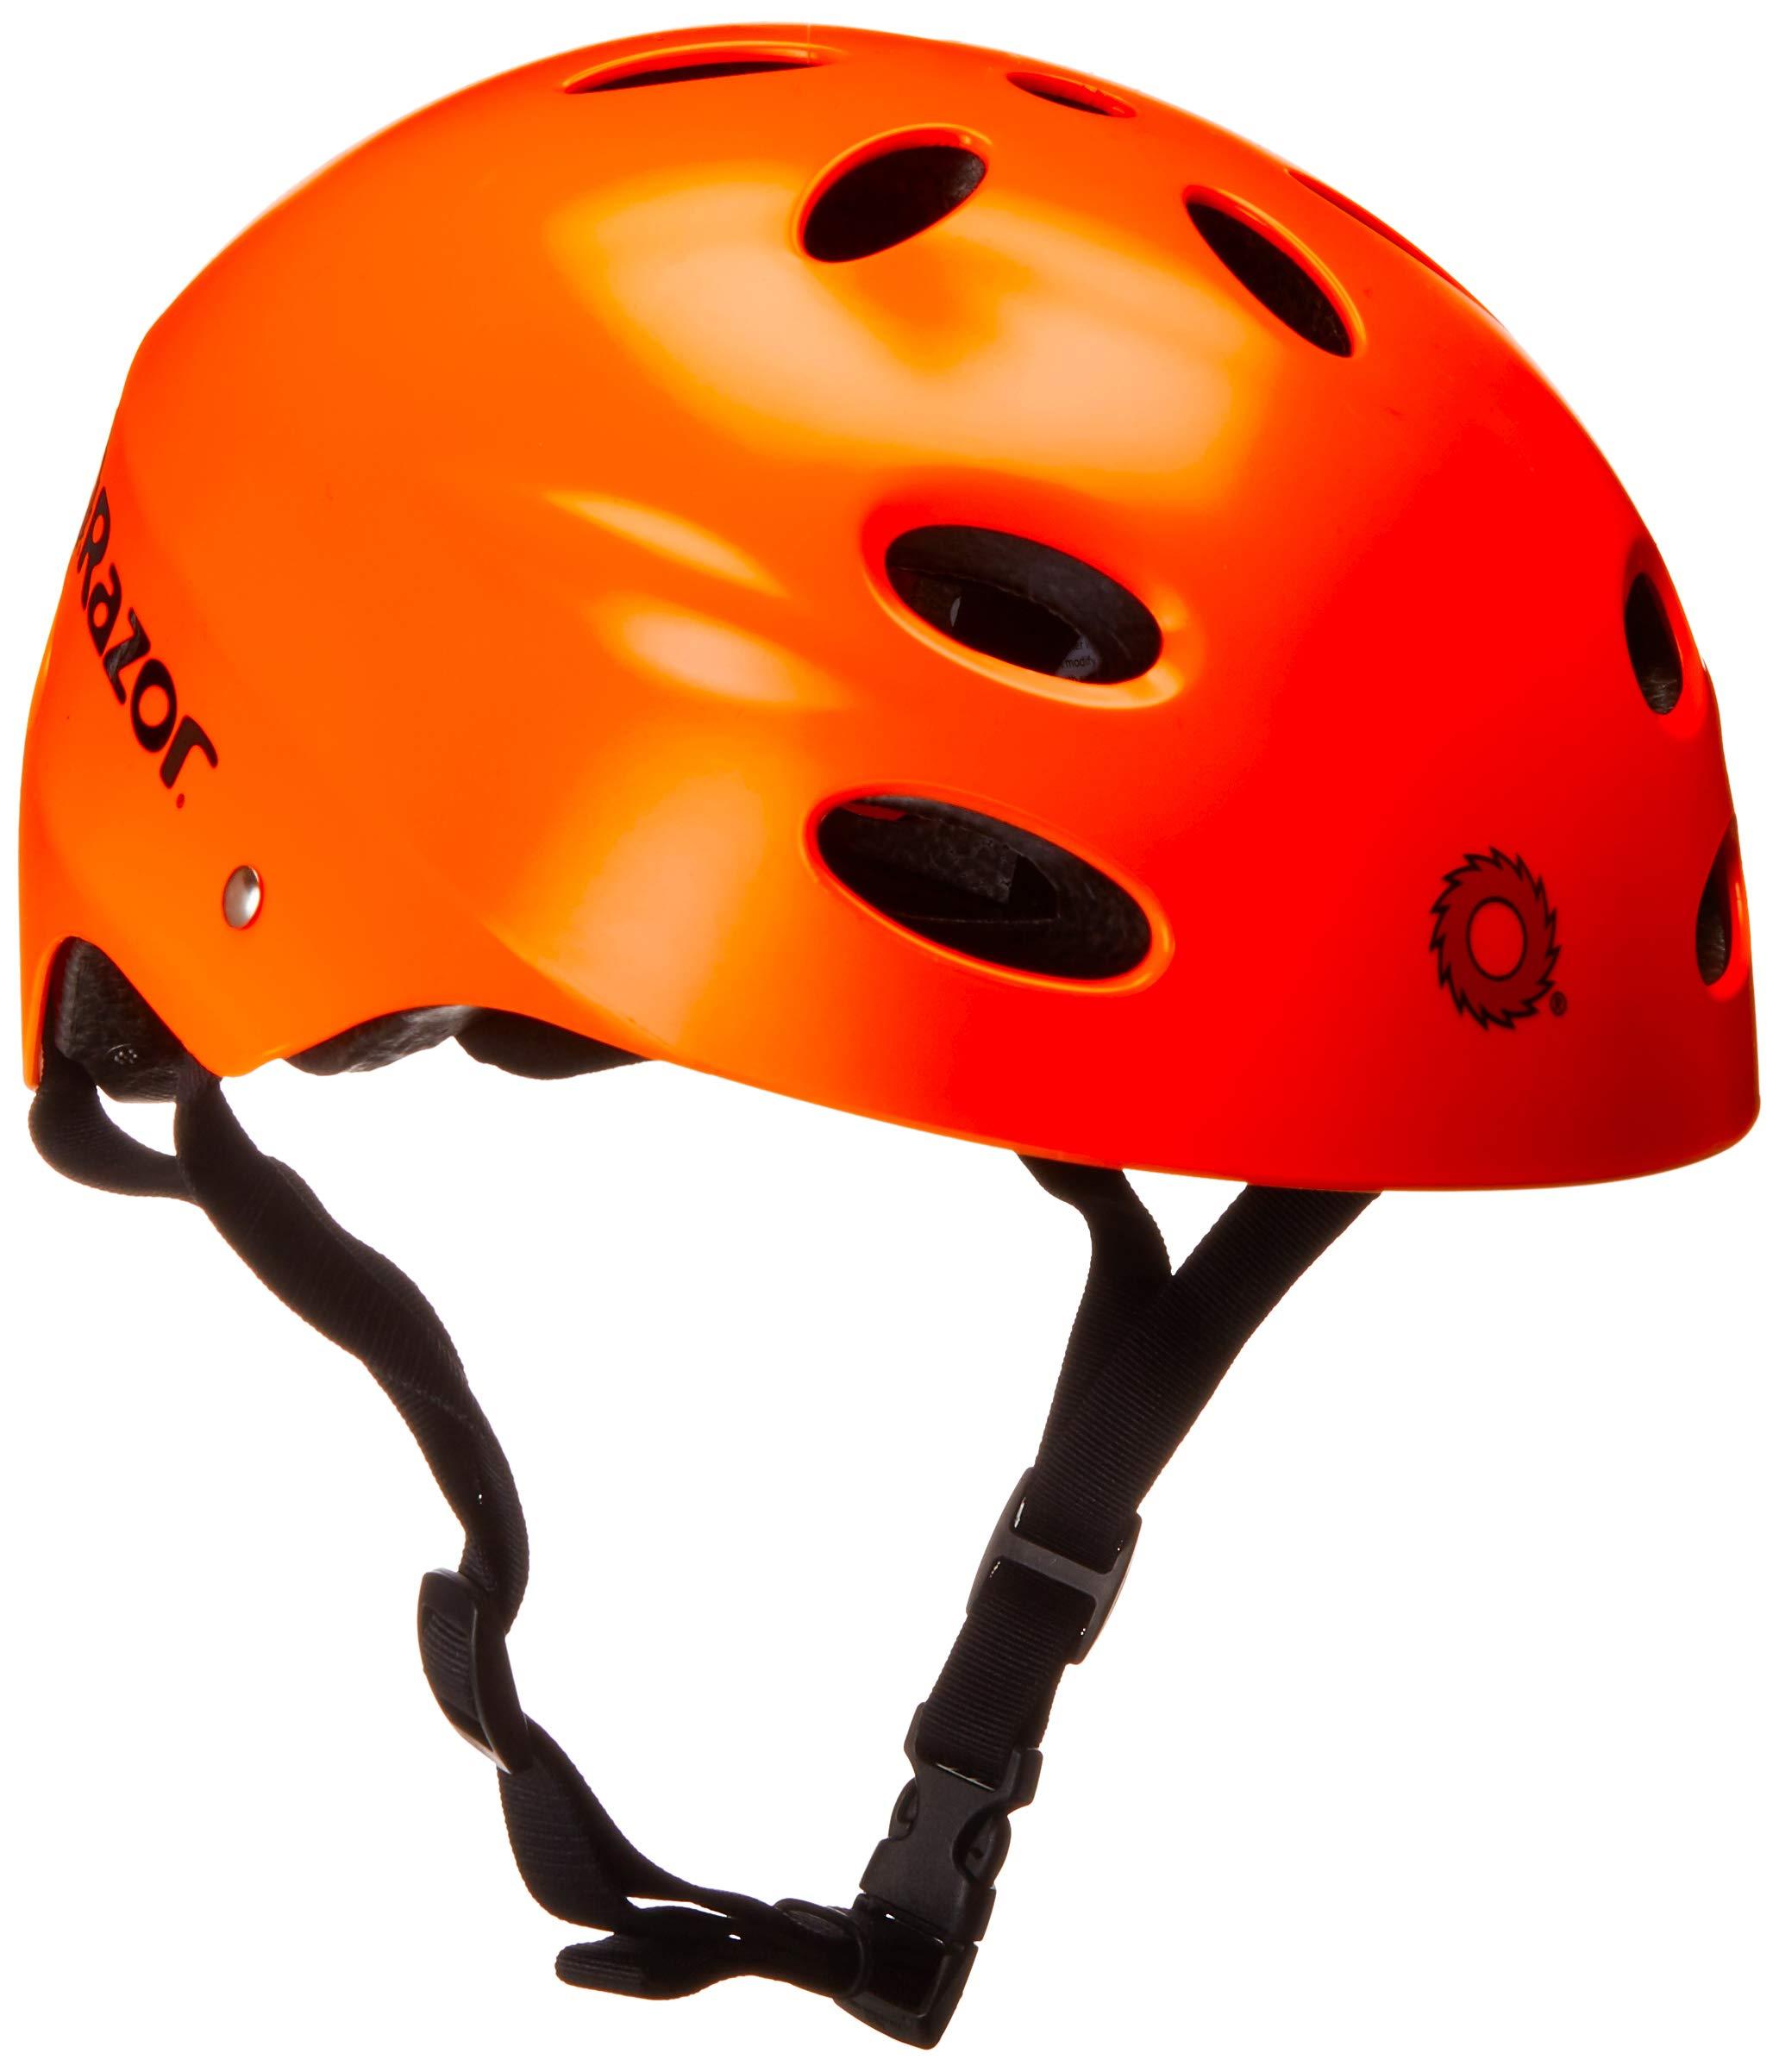 Razor 97265 V-17 Youth Muli-Sport Helmet, Neon Orange